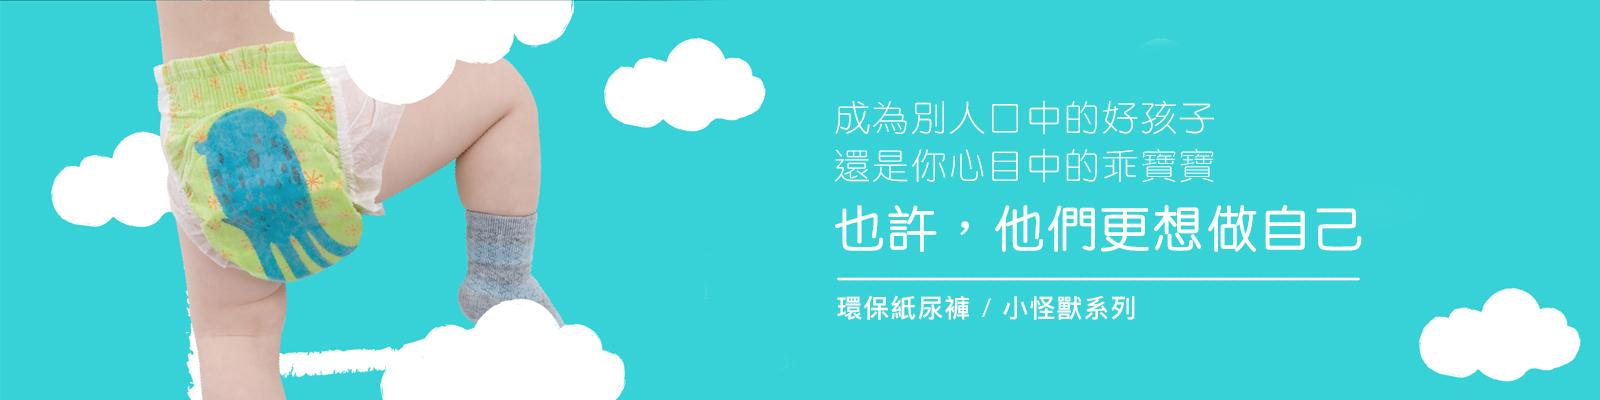 Desktop Banner for 嬰兒紙尿褲 | 沐伊孕哺MOOIMOM 全球孕婦用品領導品牌推薦